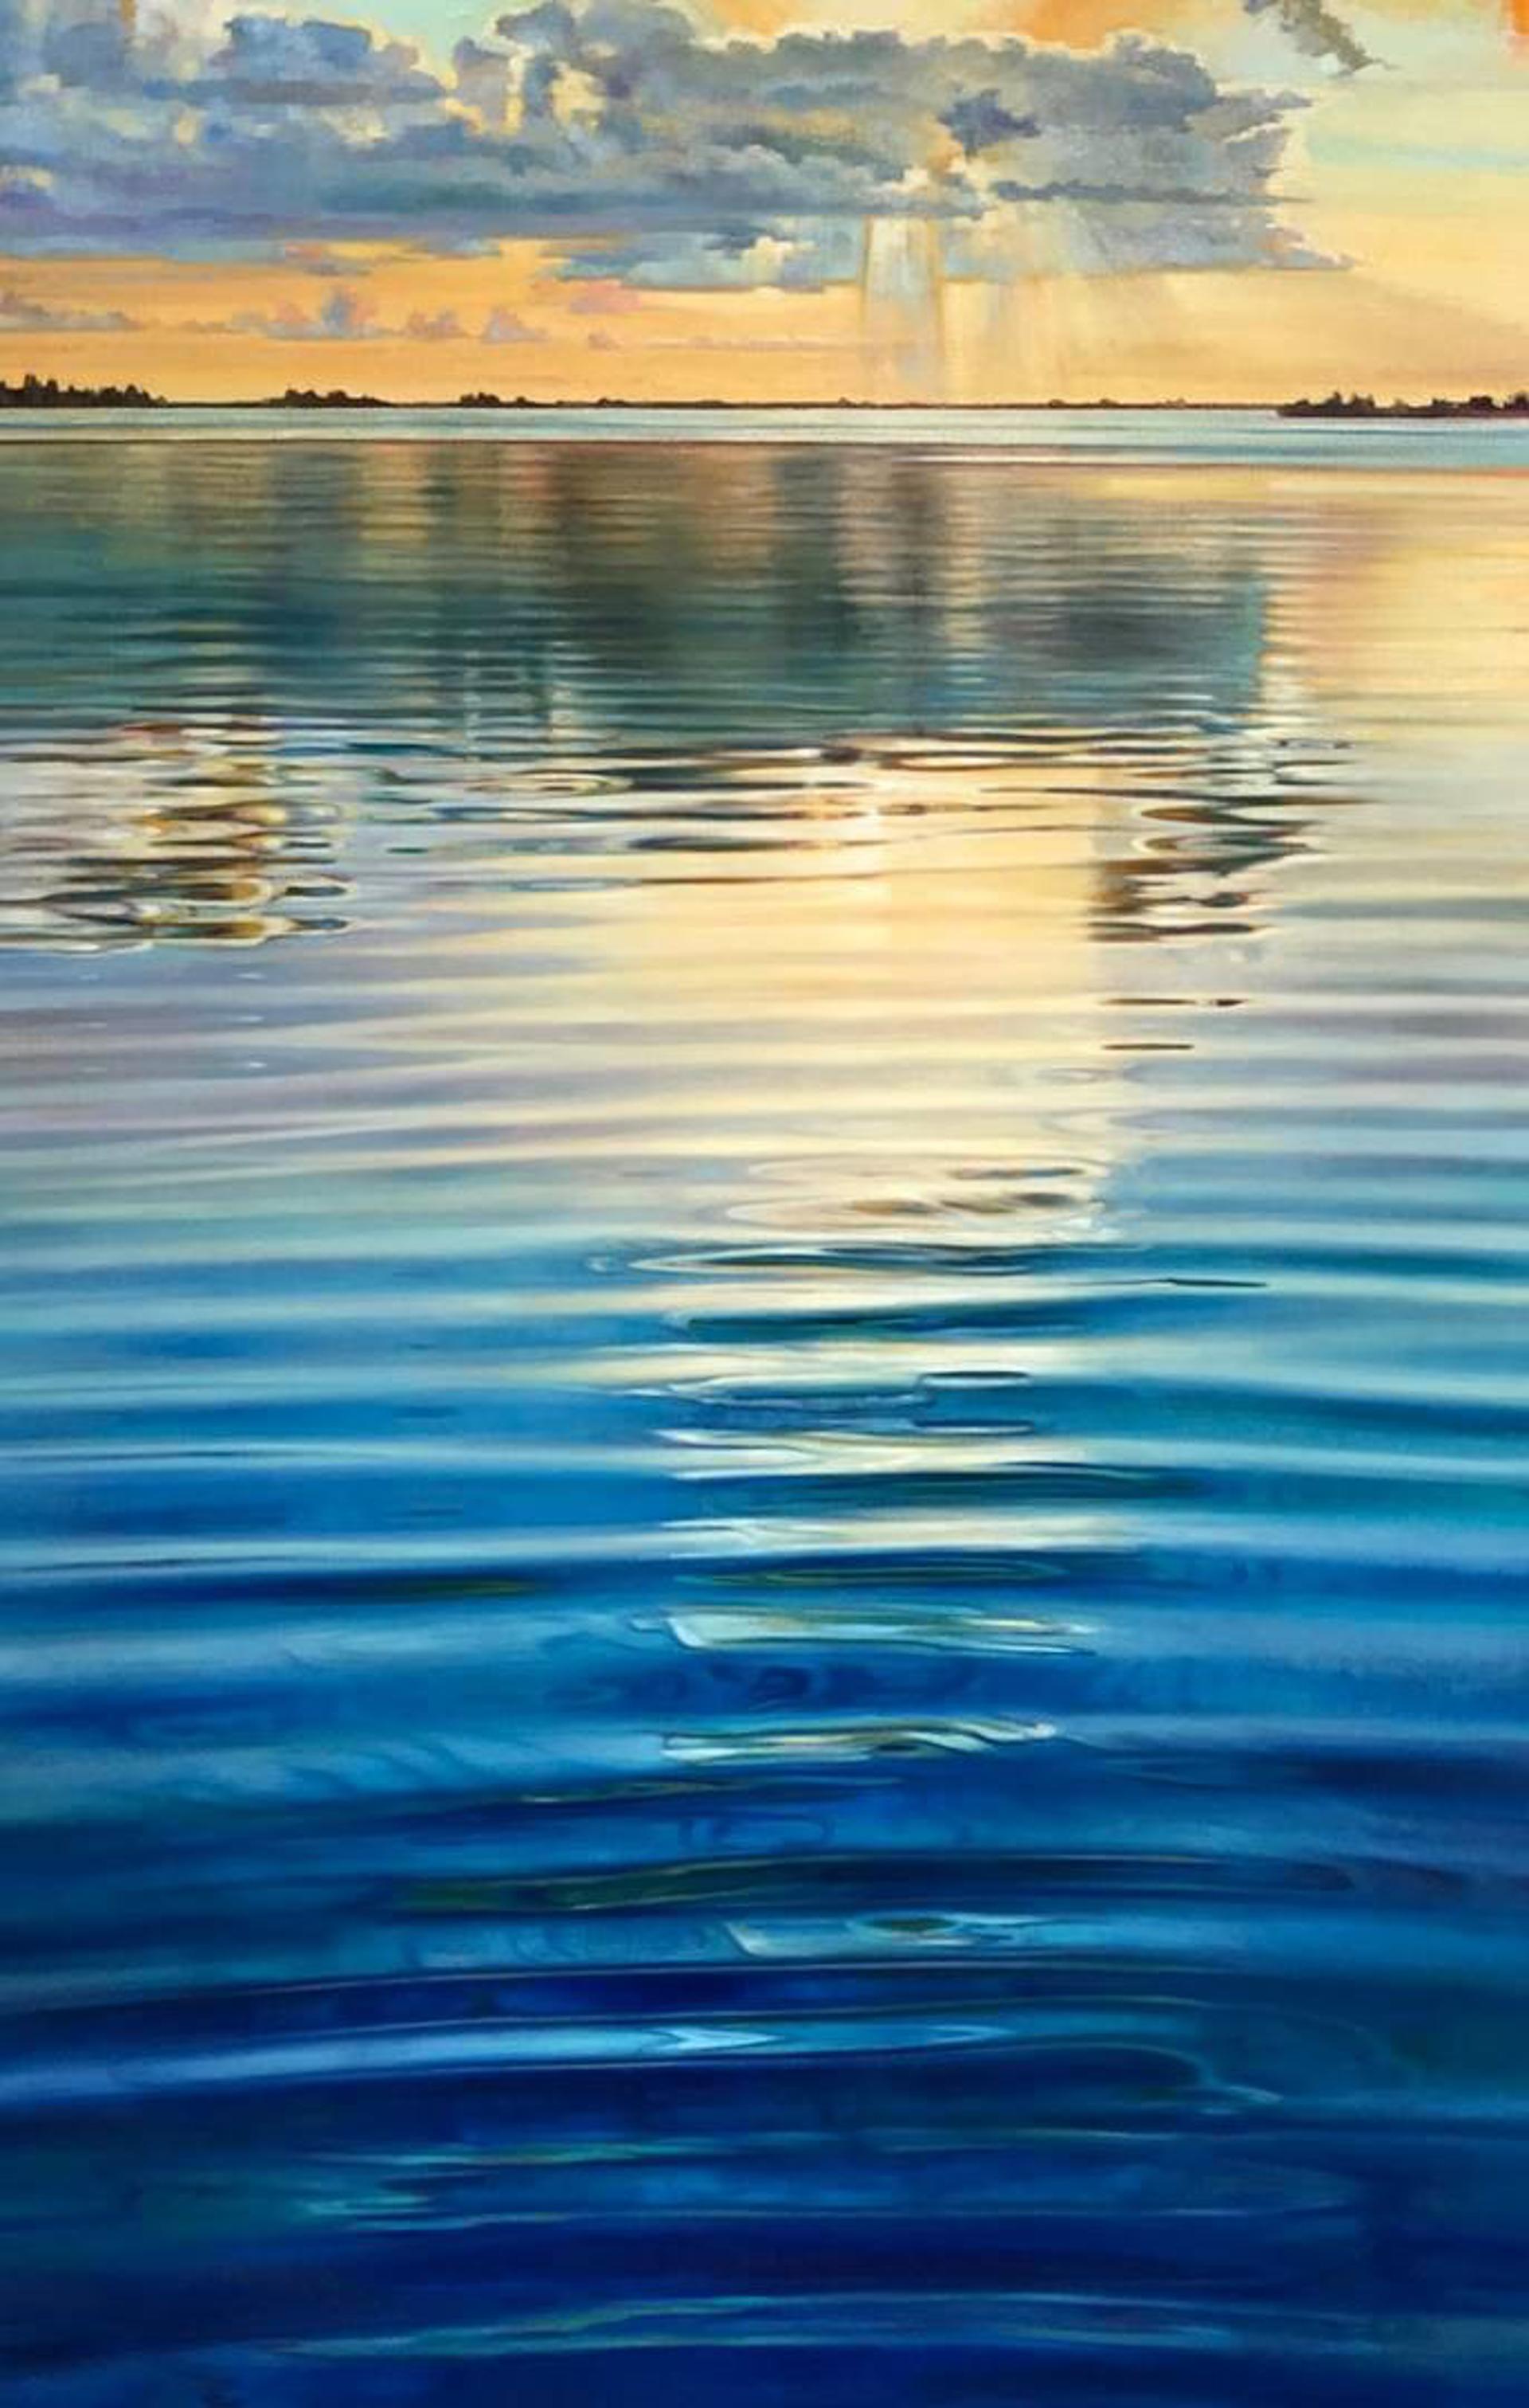 Island Reflections by Caroline Zimmermann